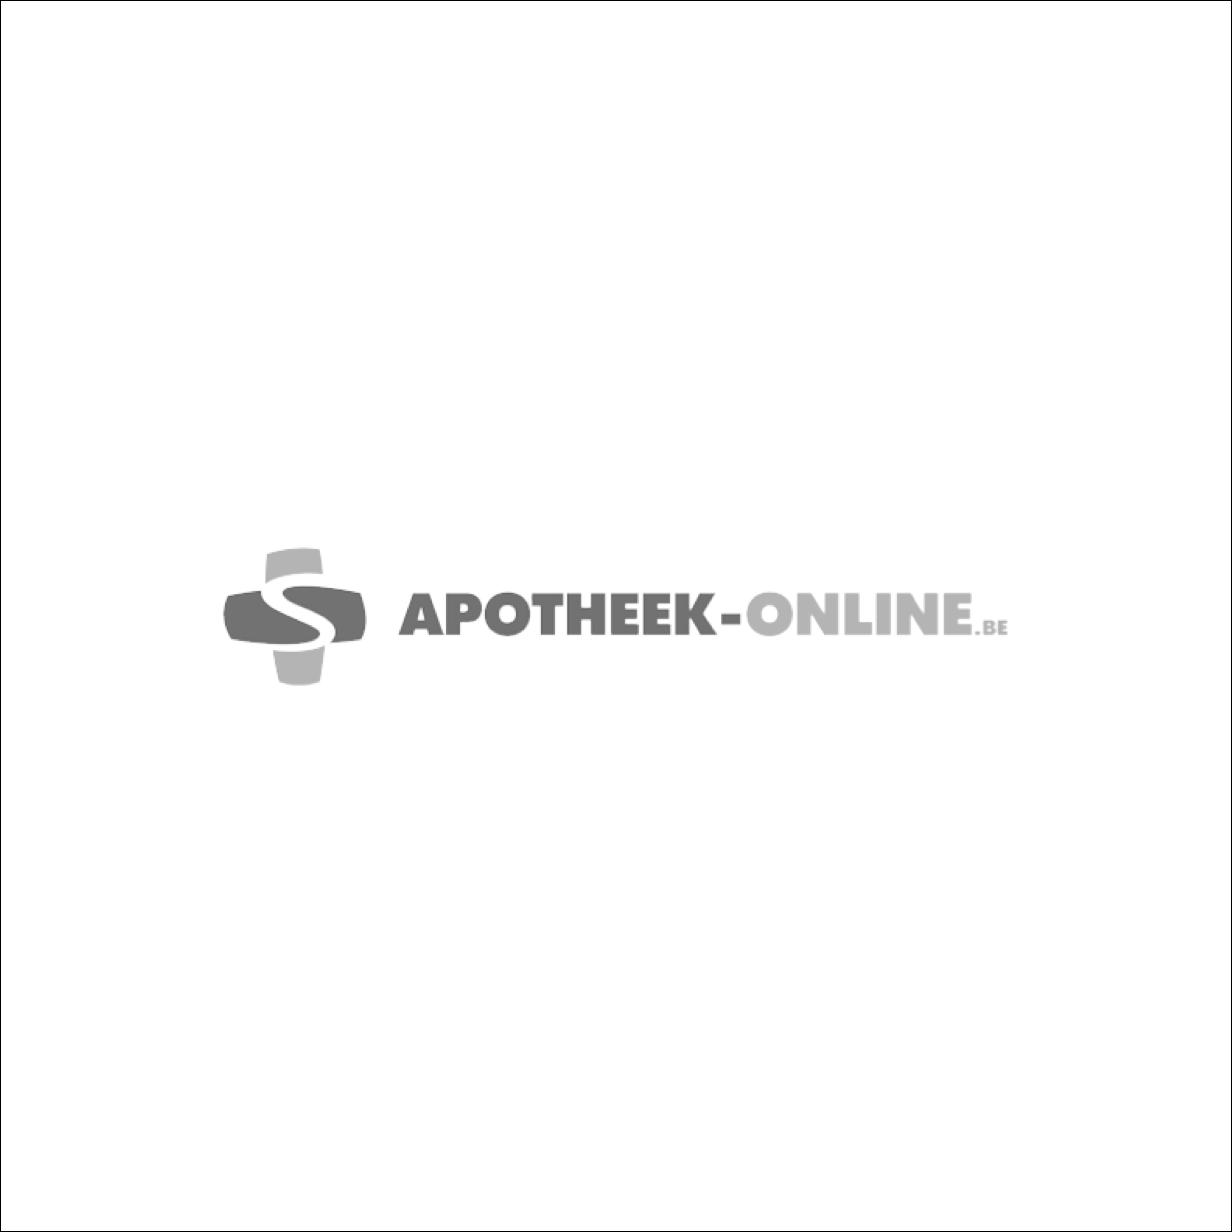 MESOFT CP STER 4C 20,0X10,0CM 60X 2 156440